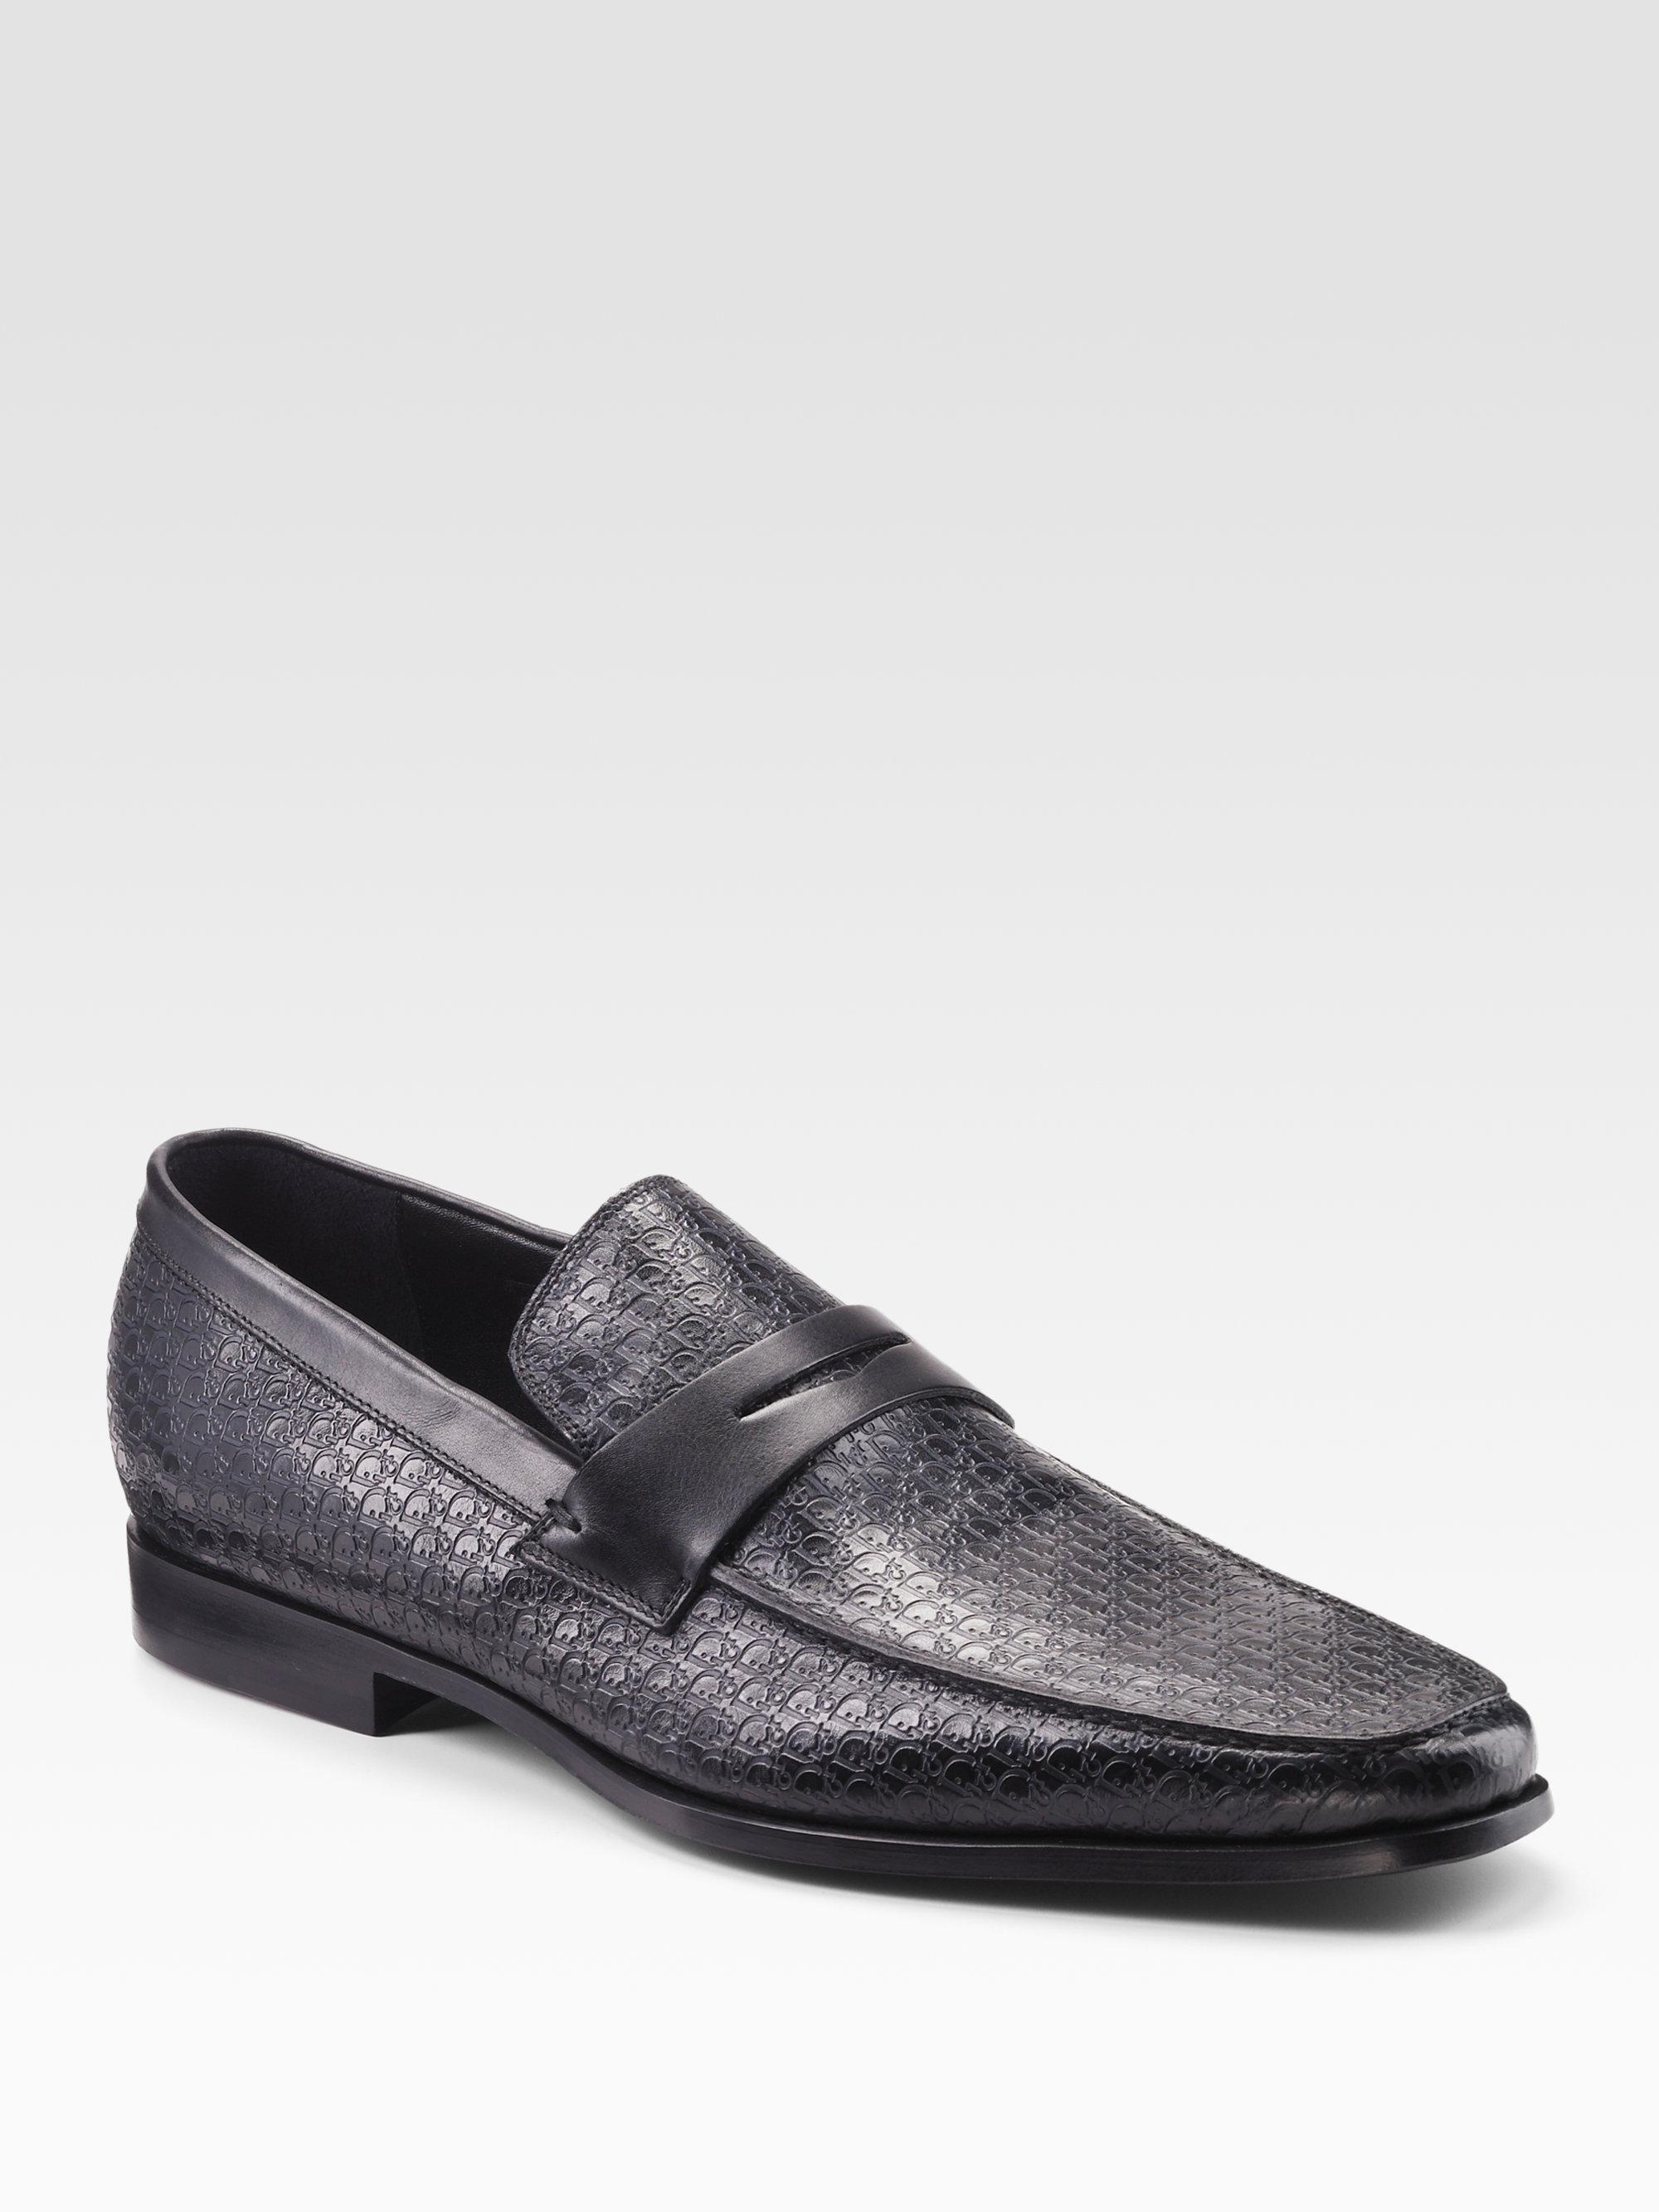 for sale cheap price Dior Men's Black Leather Loafers sale purchase VkJ91SjG0j